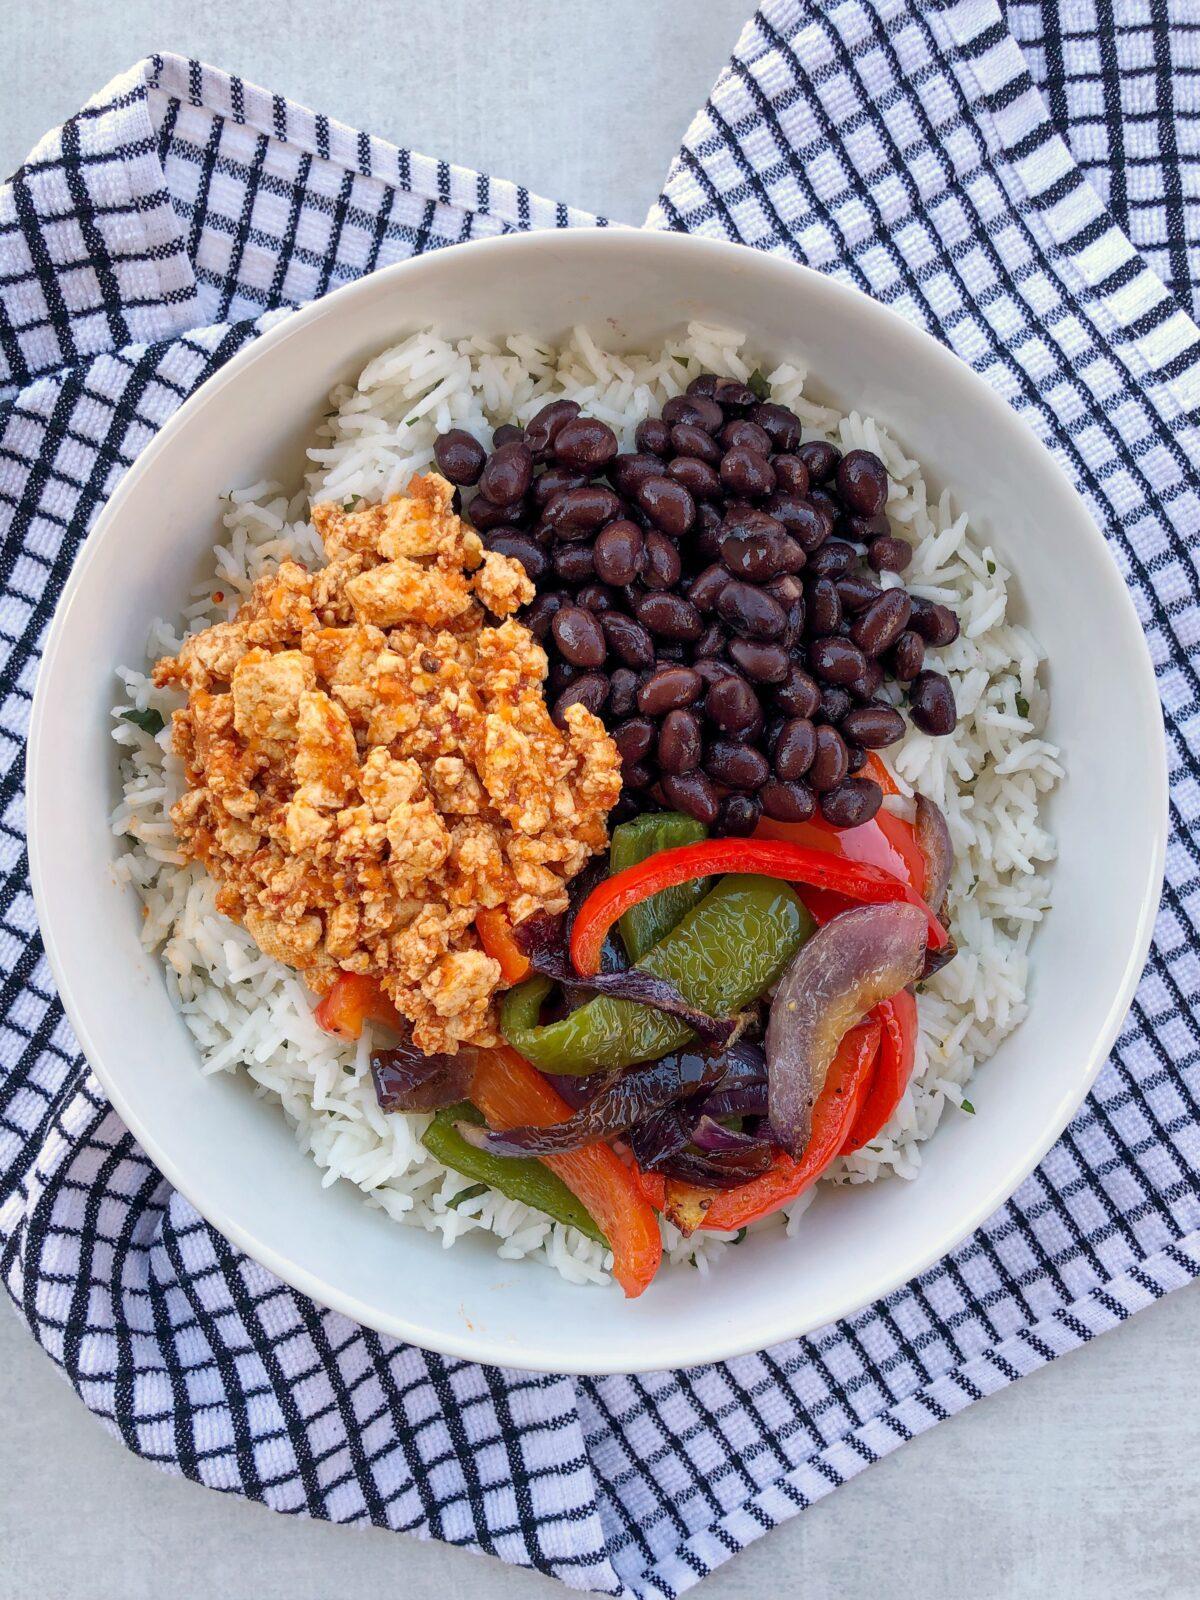 Easy Homemade Tofu Sofritas Burrito Bowl with Cilantro Lime Rice